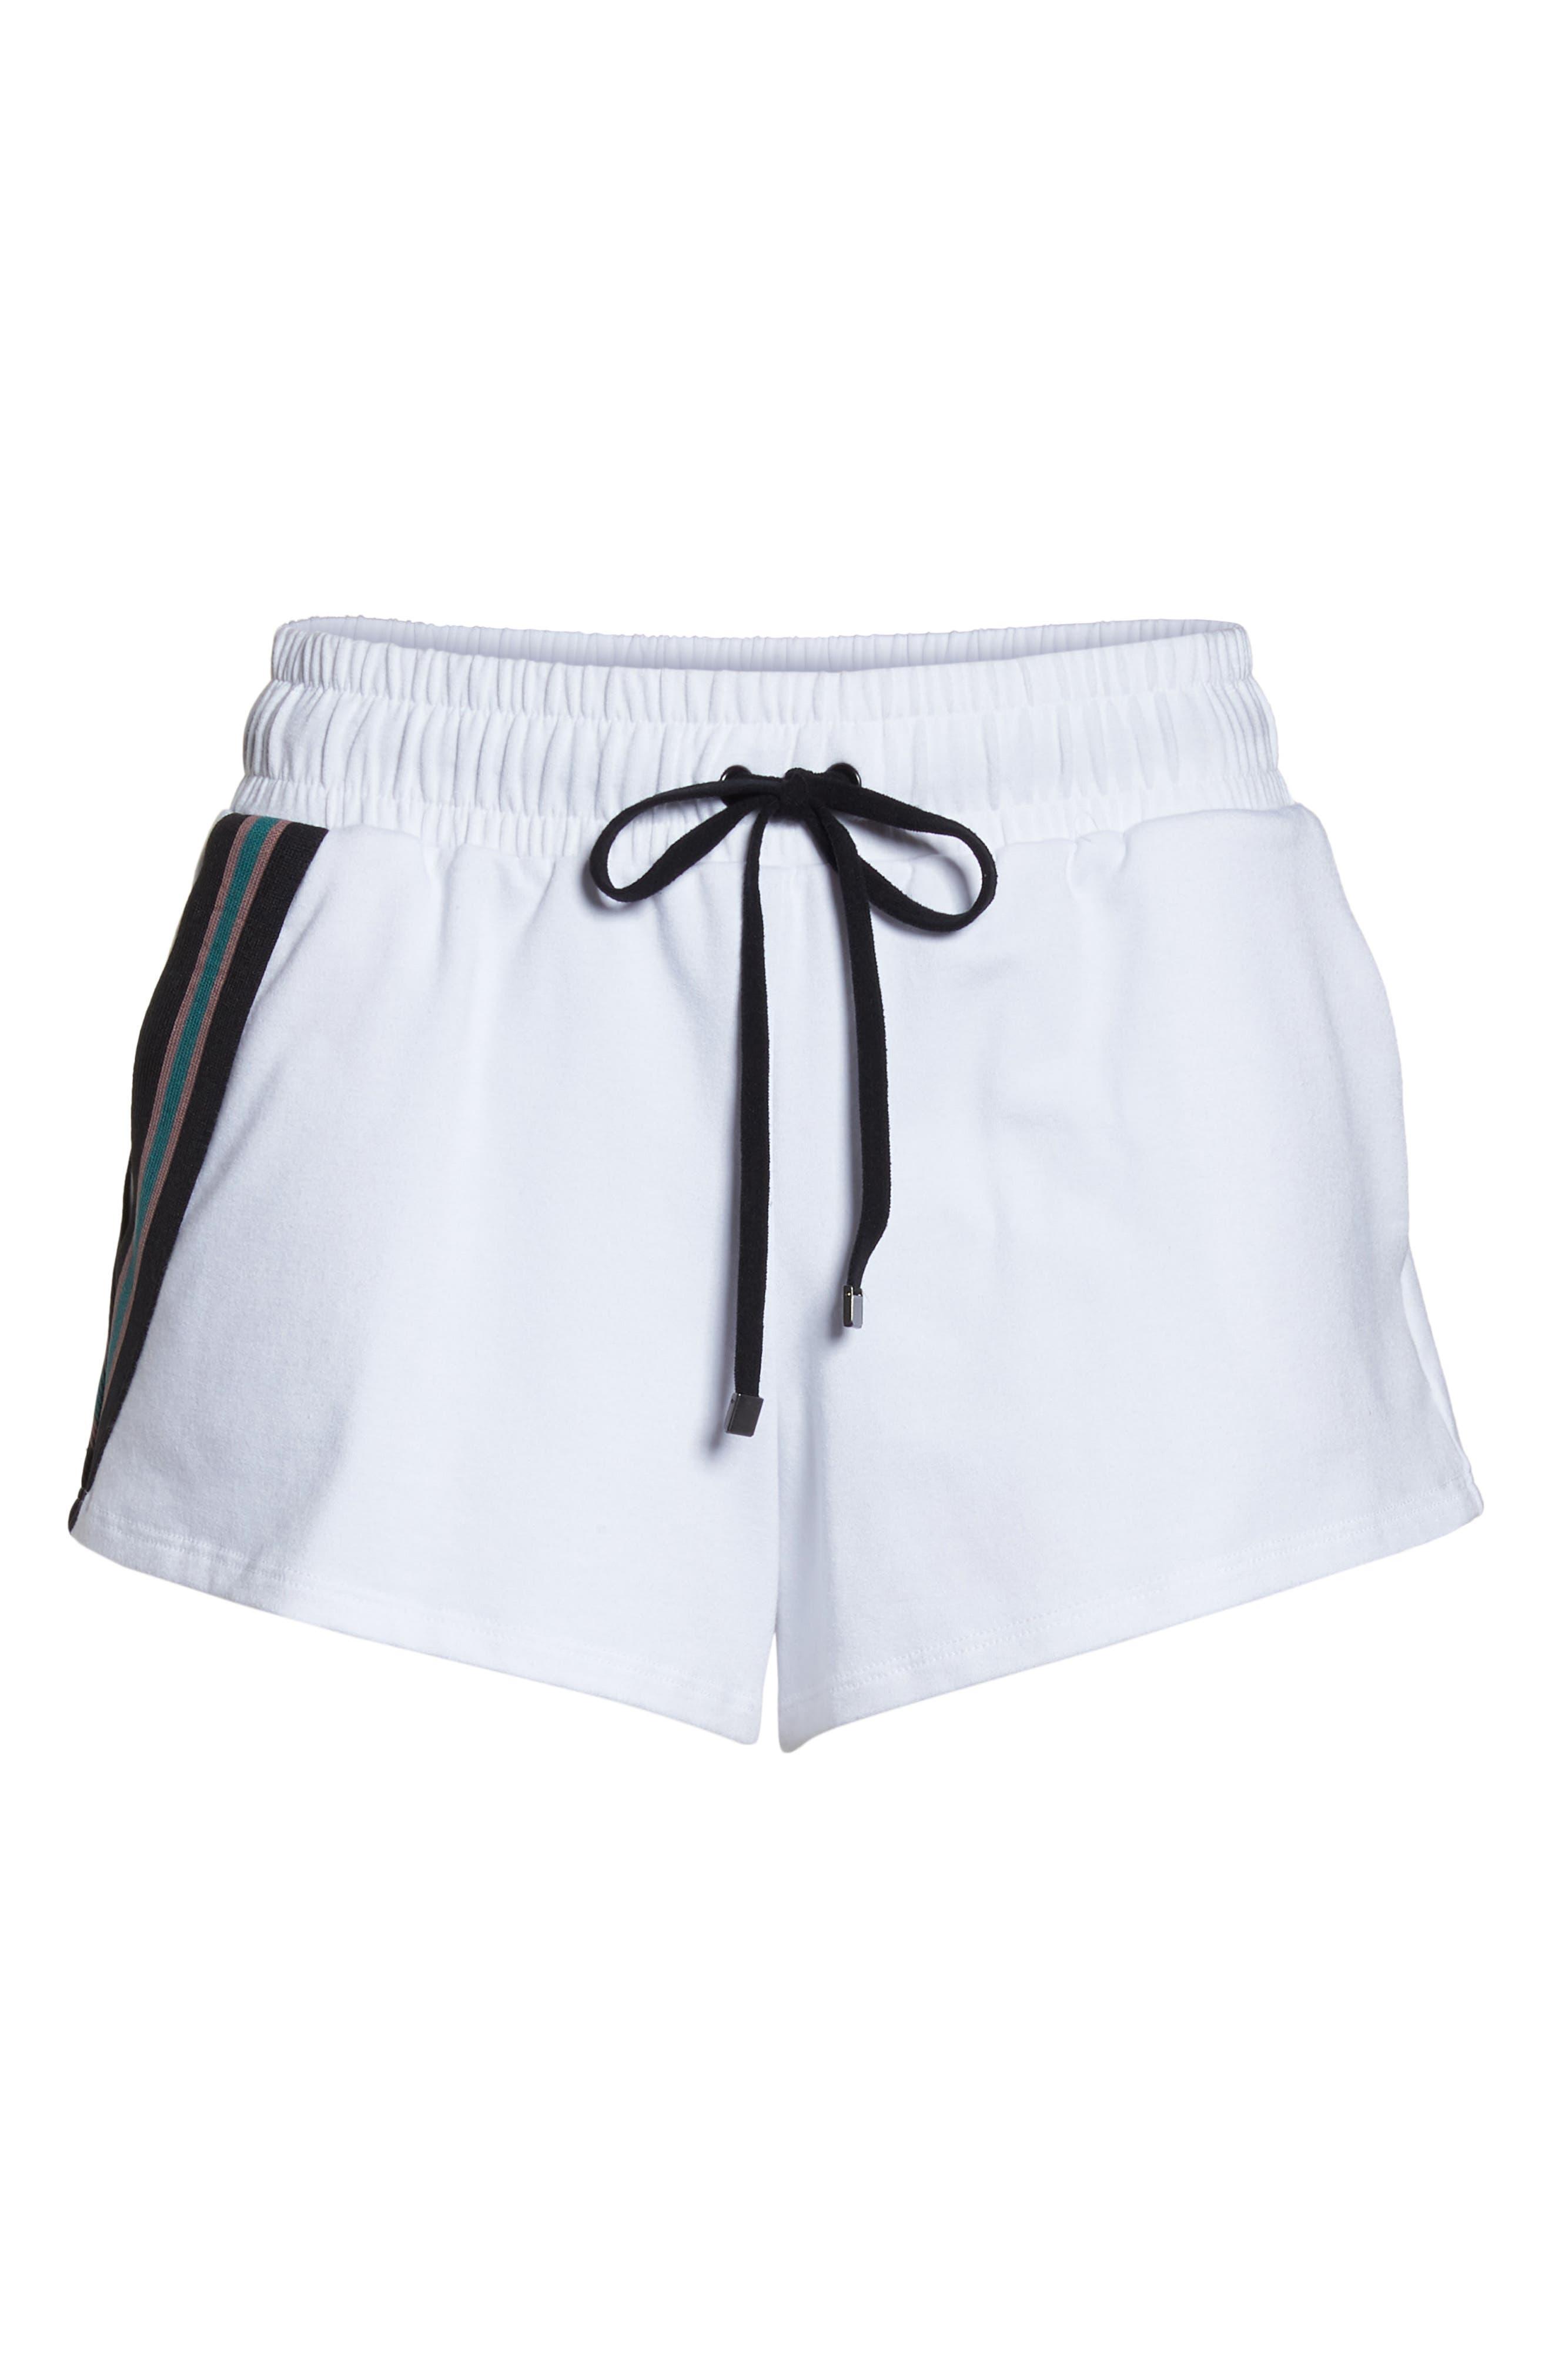 Beam Shorts,                             Alternate thumbnail 6, color,                             WHITE